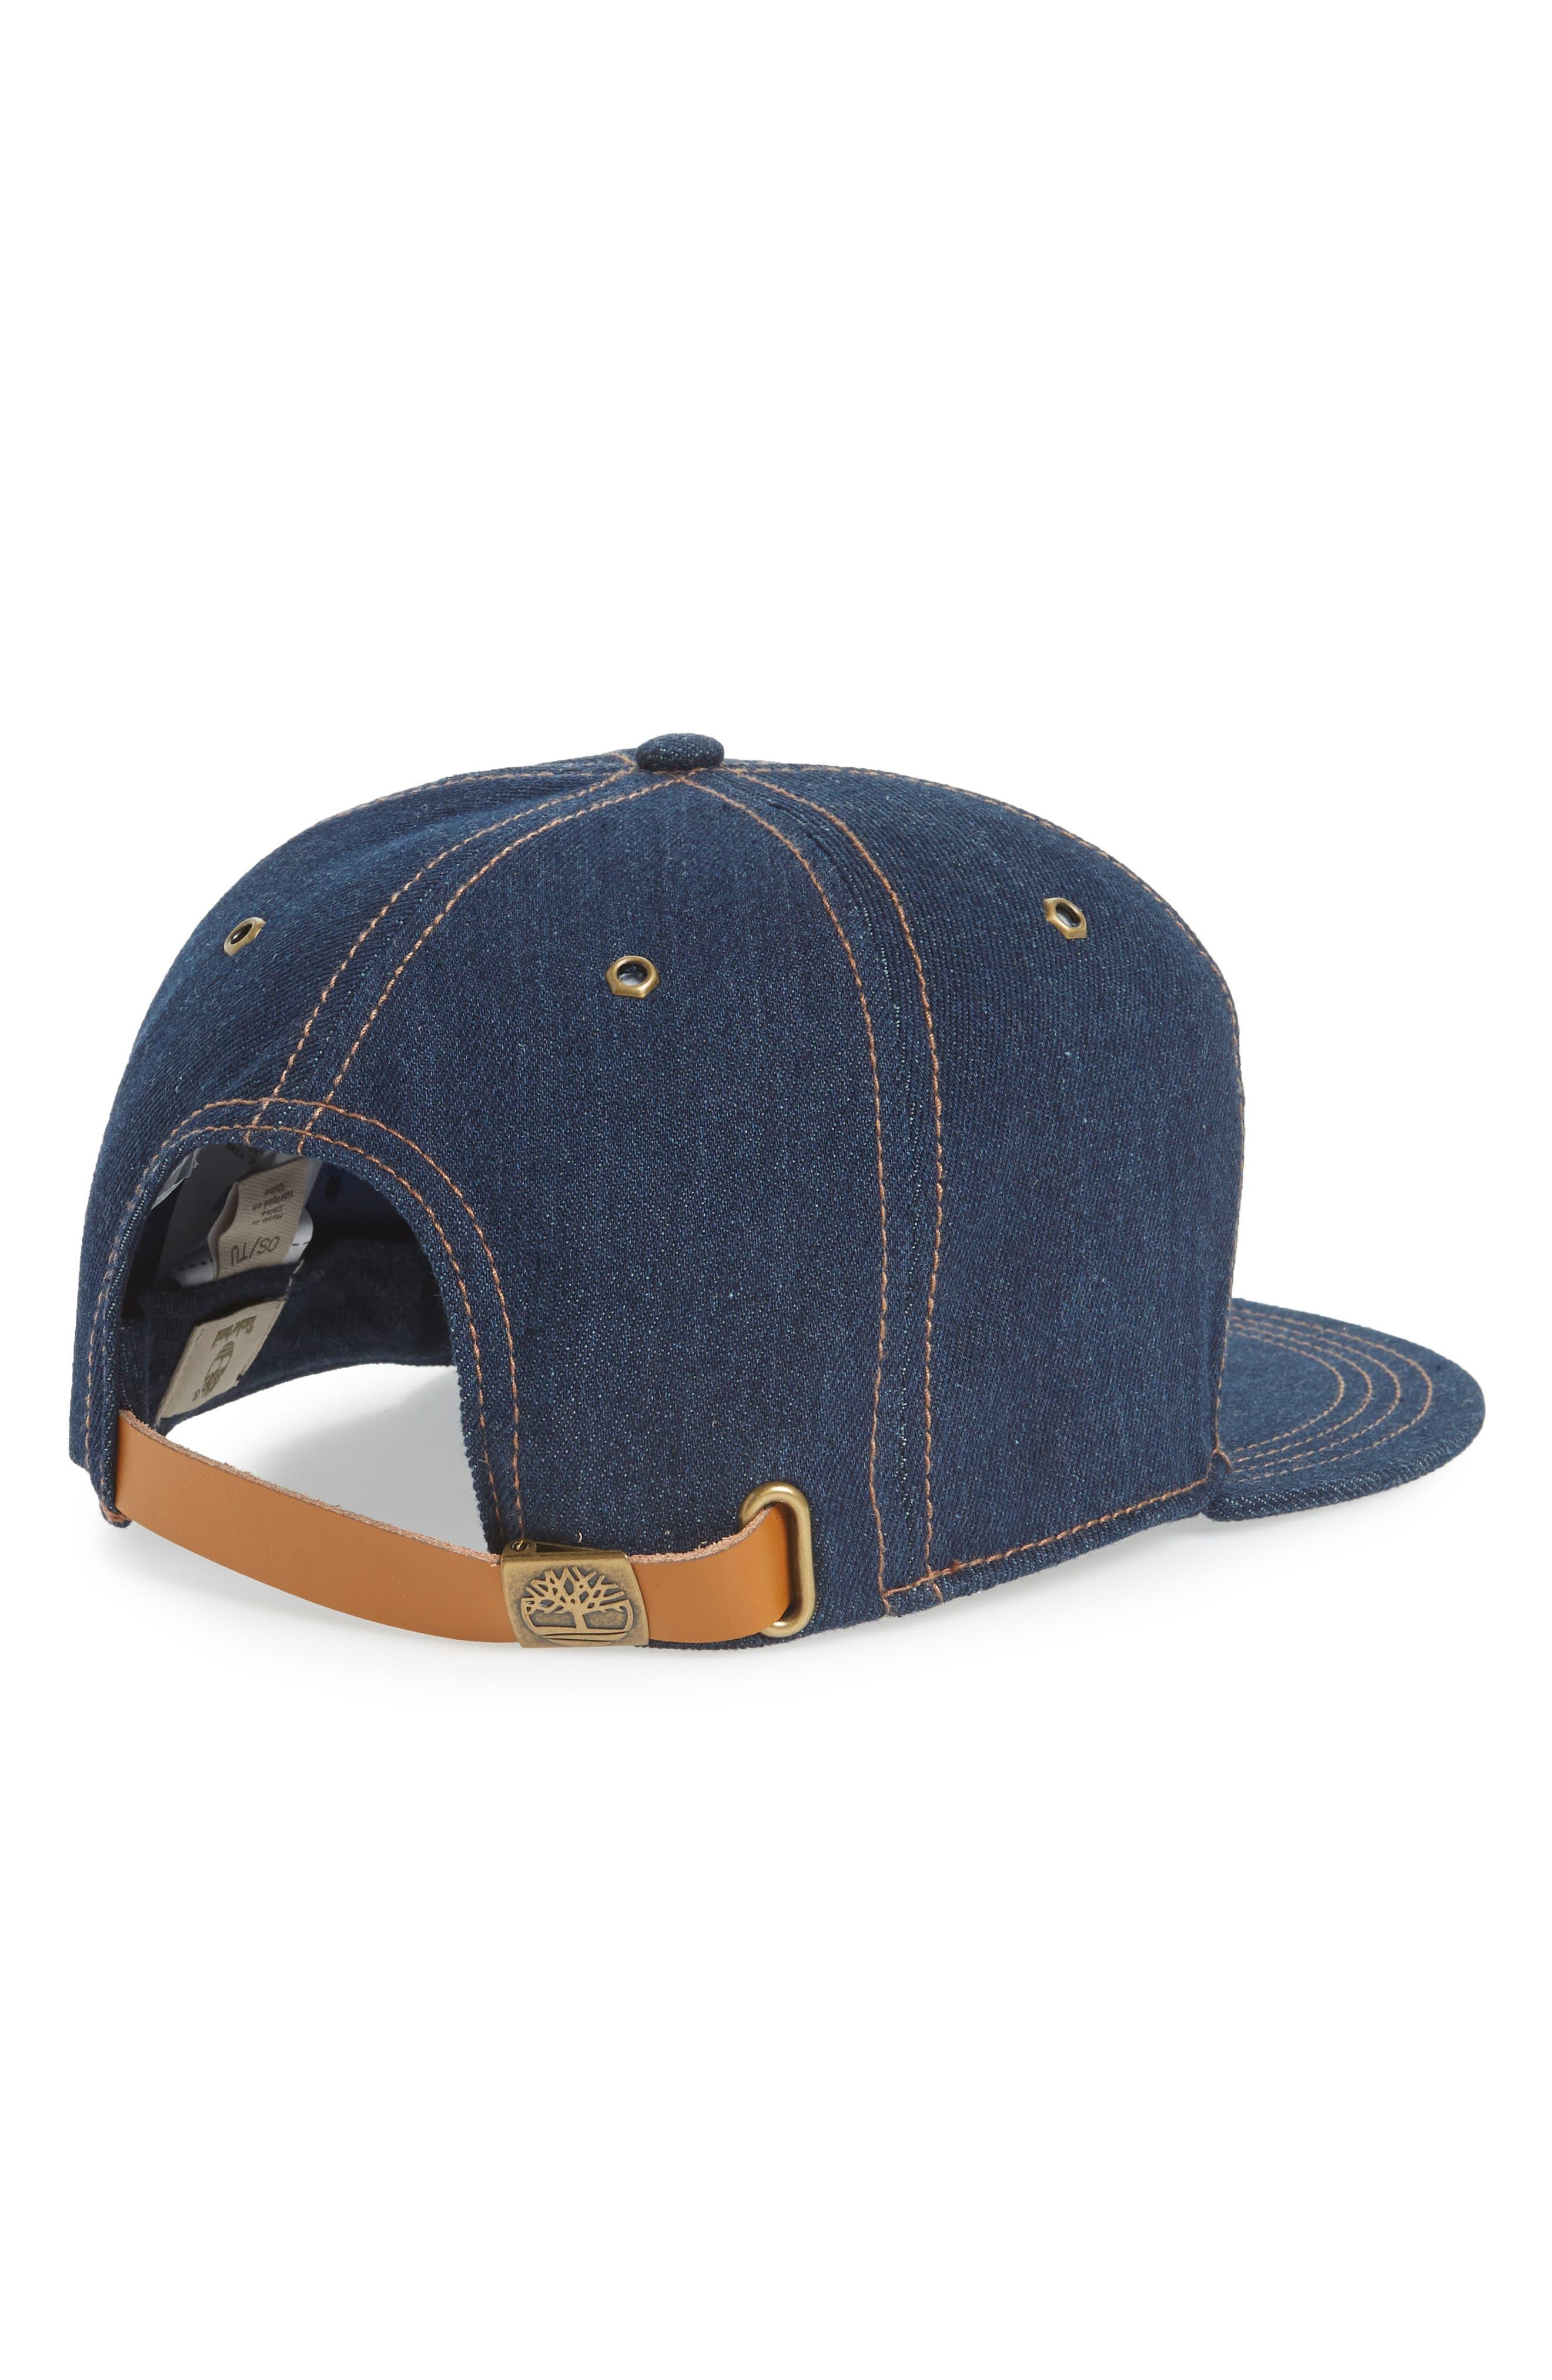 Plum Island Baseball Cap,                             Alternate thumbnail 2, color,                             DARK DENIM